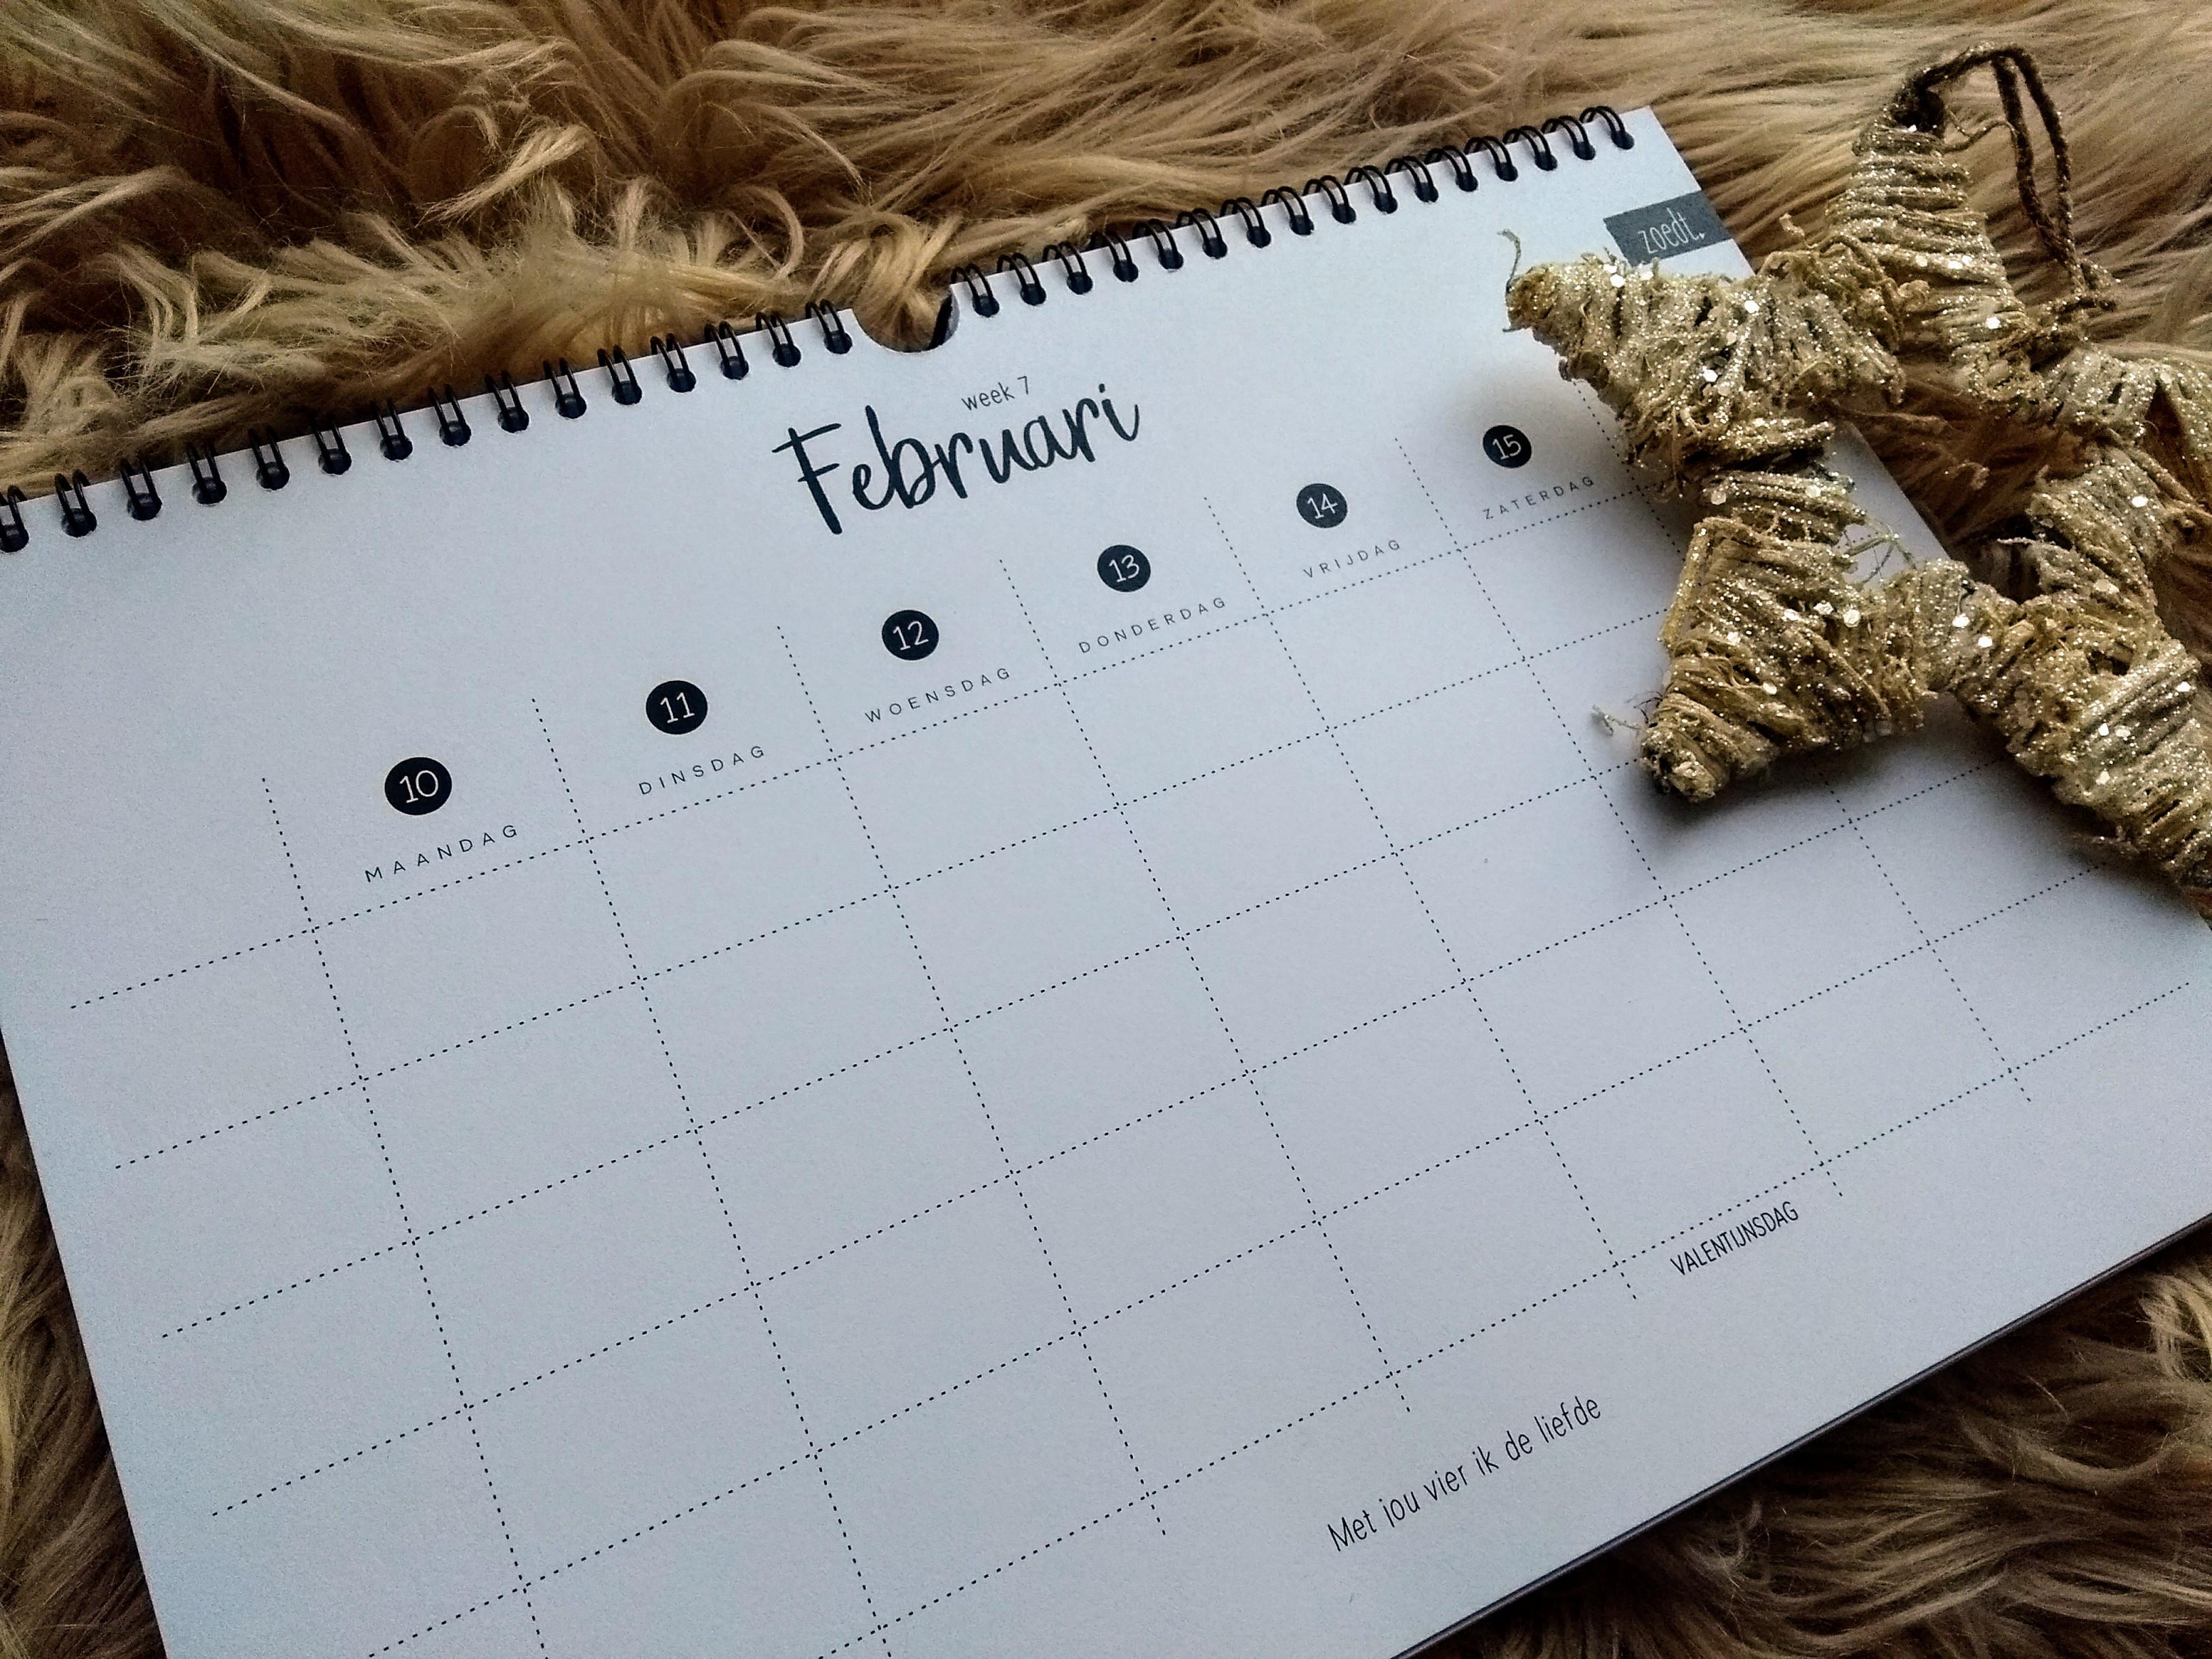 familiekalender, familieplanner, agenda, plannen, gezin, weekoverzicht, weekplanner, gezin van vijf, drie kinderen, review familieplanner, familieplanner Zoedt, mamablog, mamalifestyle, lalogblog, lalog.nl , lalog